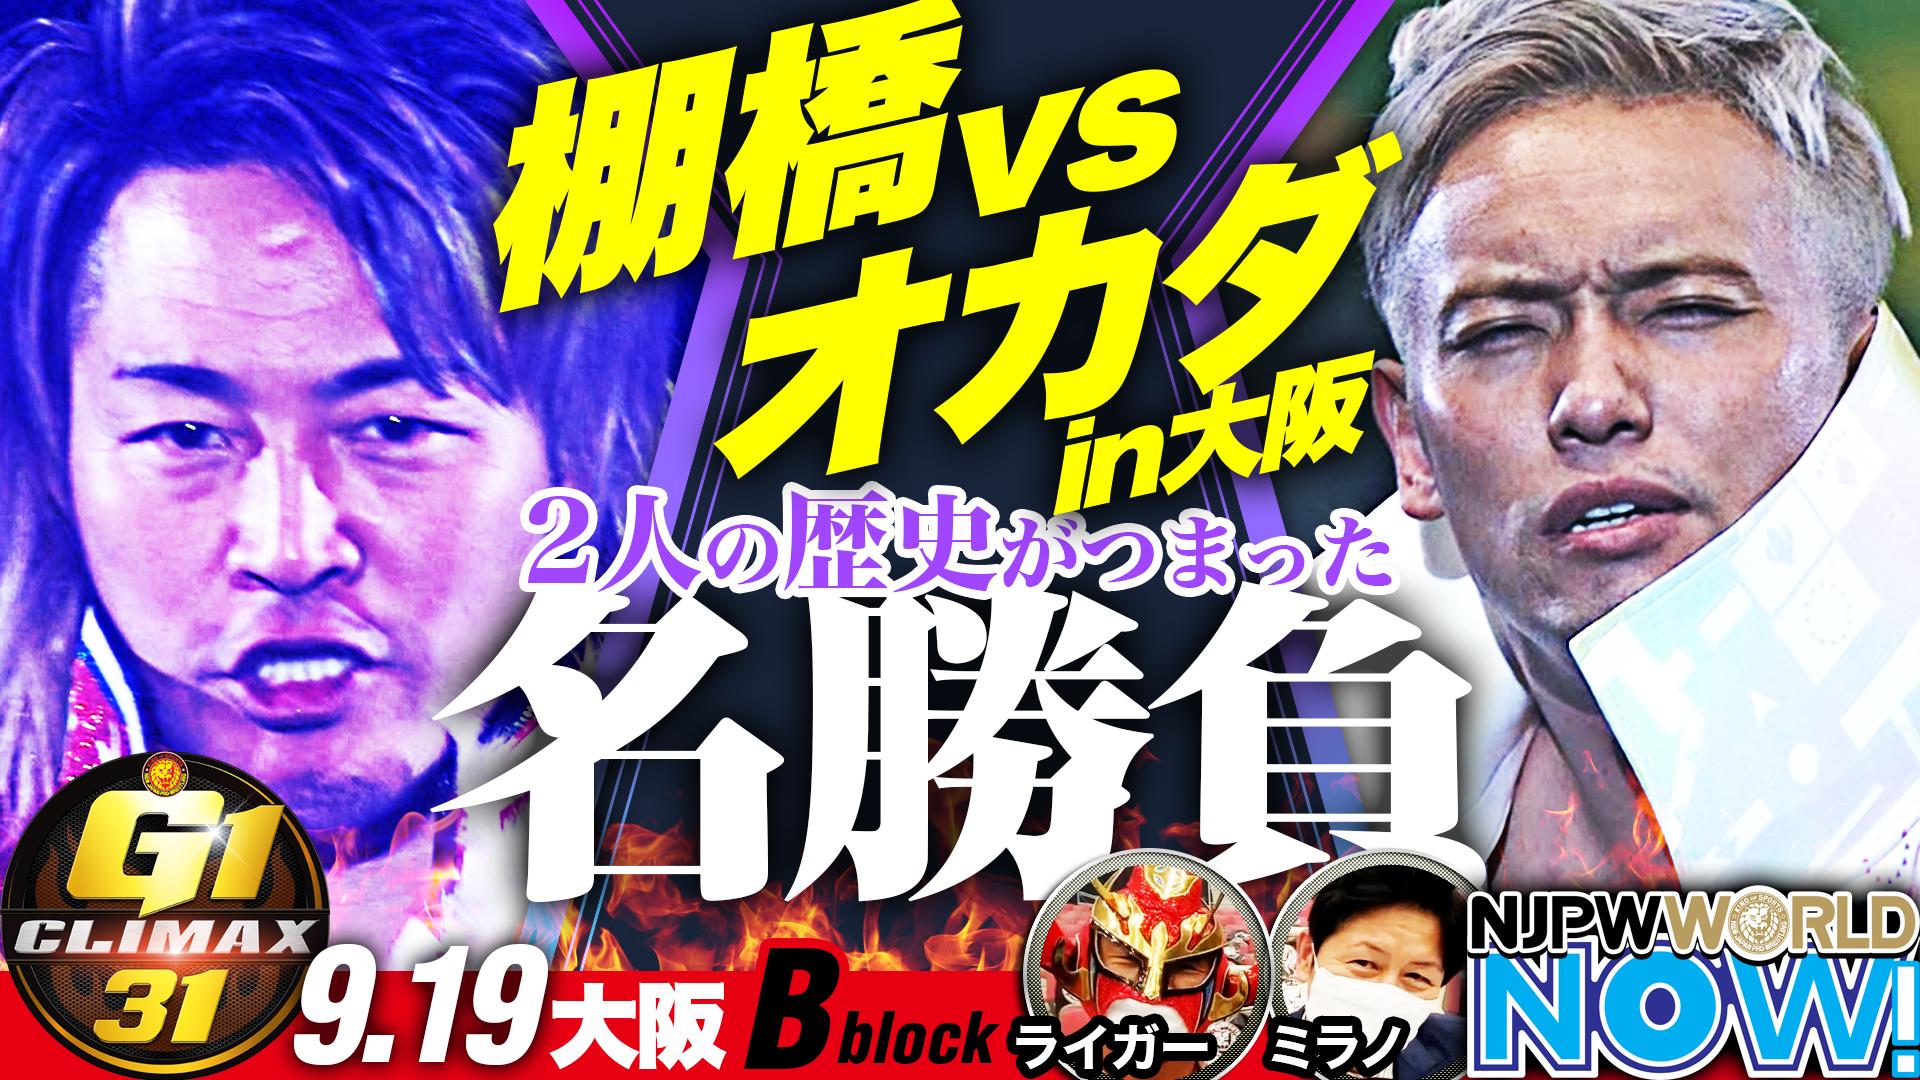 『G1 CLIMAX 31』大阪大会2日目❗️ライガー&ミラノが徹底解説‼️